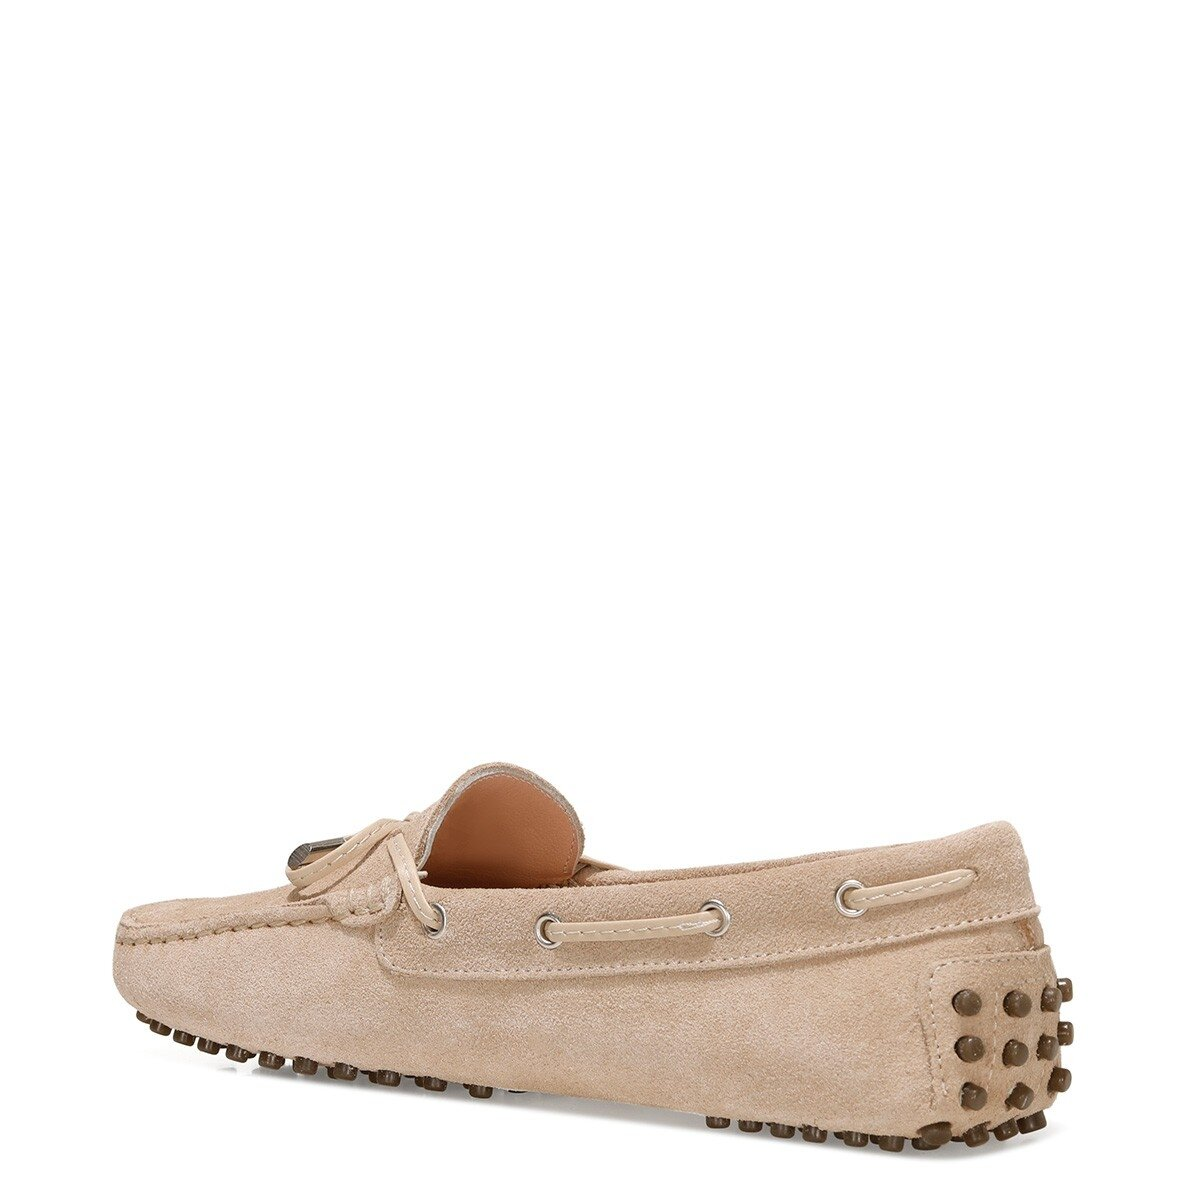 NEWHOLT2 1FX Kum Rengi Kadın Loafer Ayakkabı